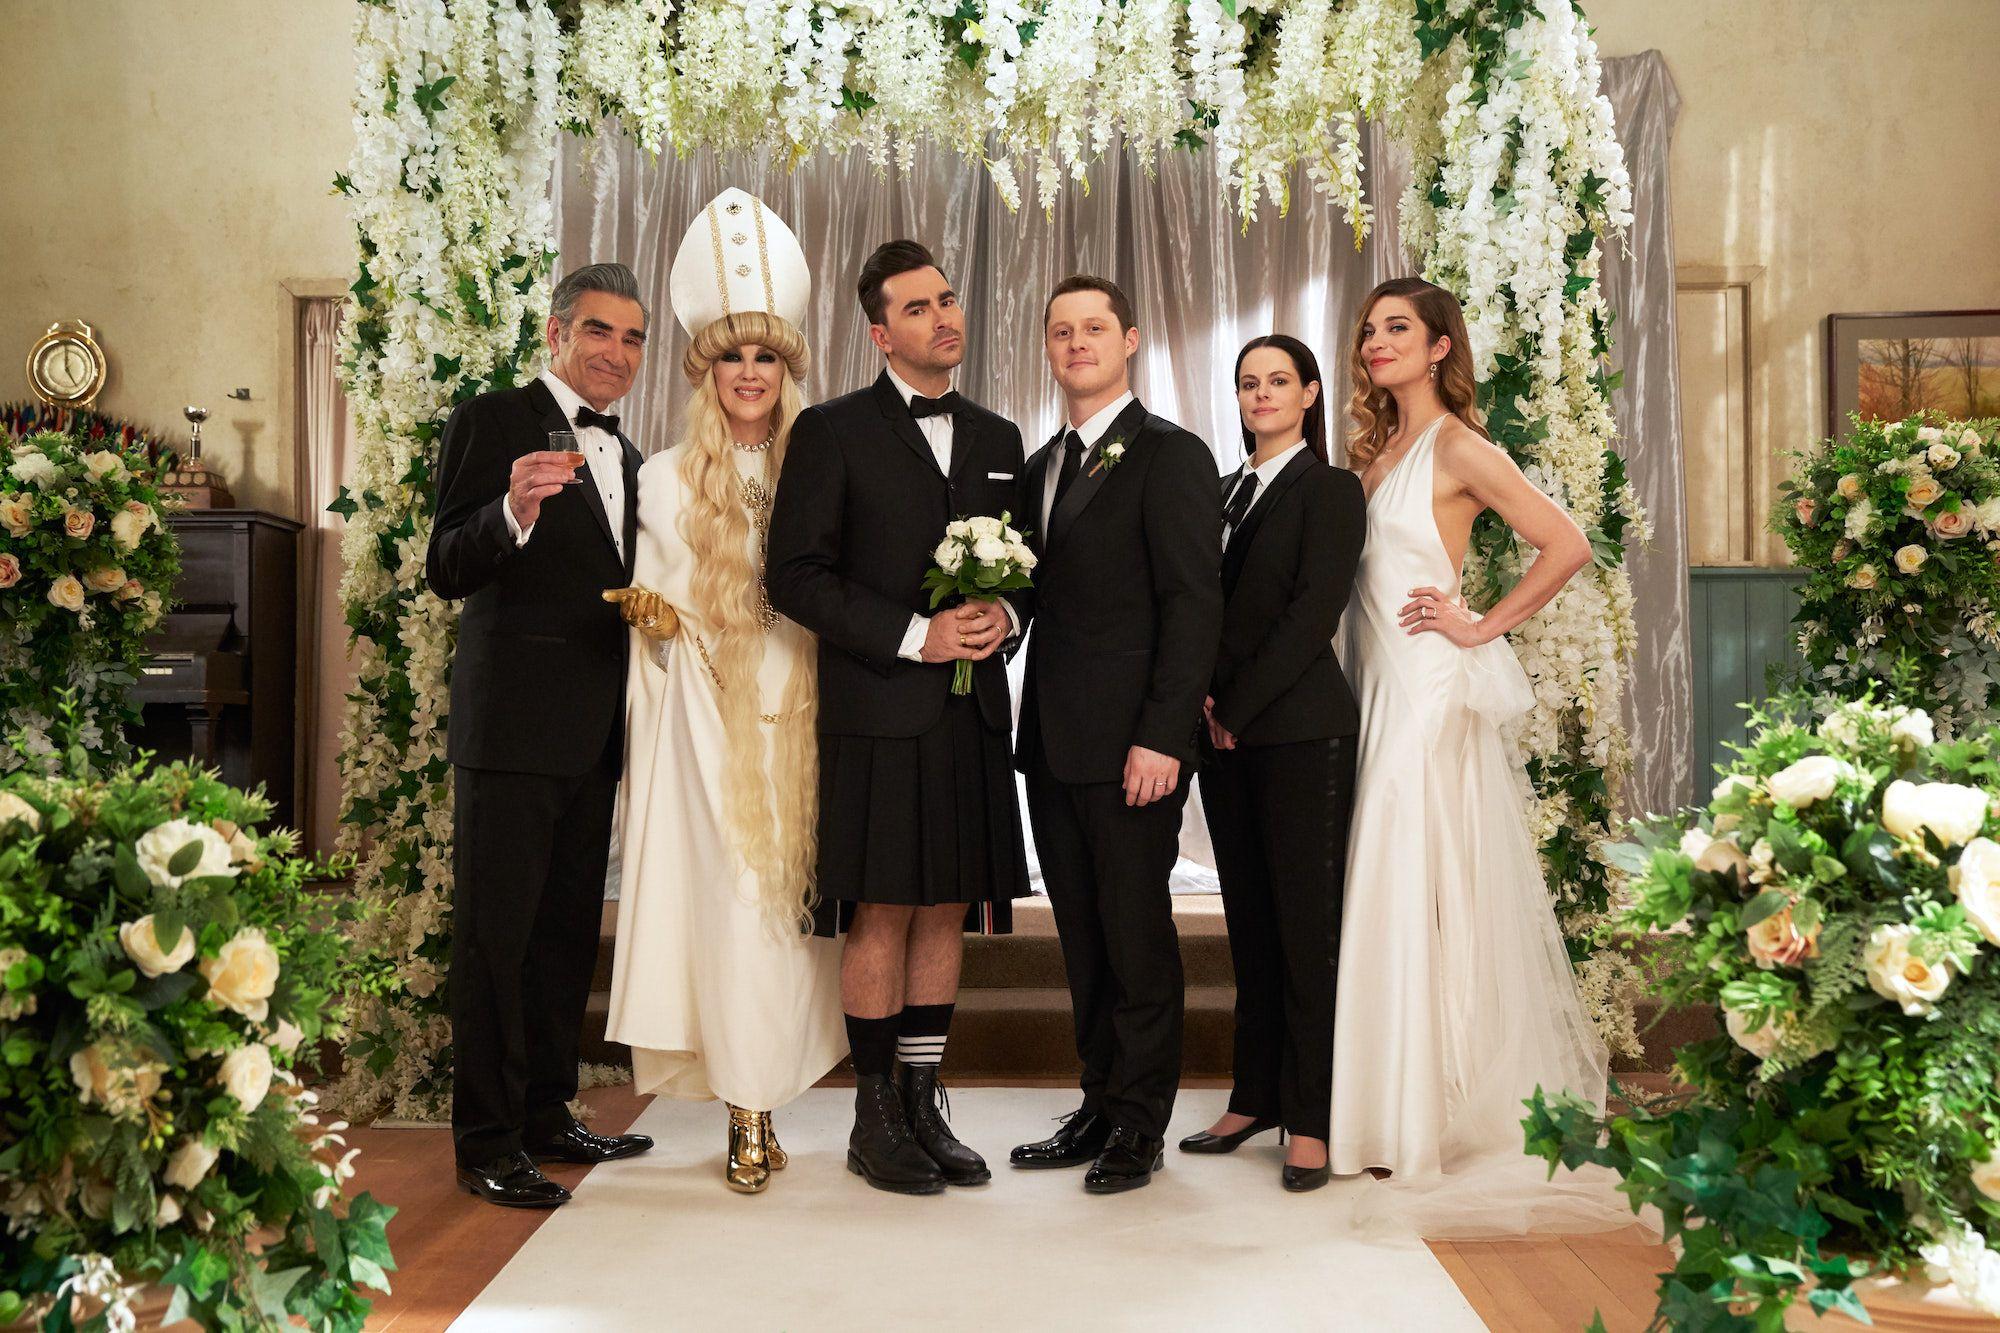 Wedding Seth Rogen Wife And Kids